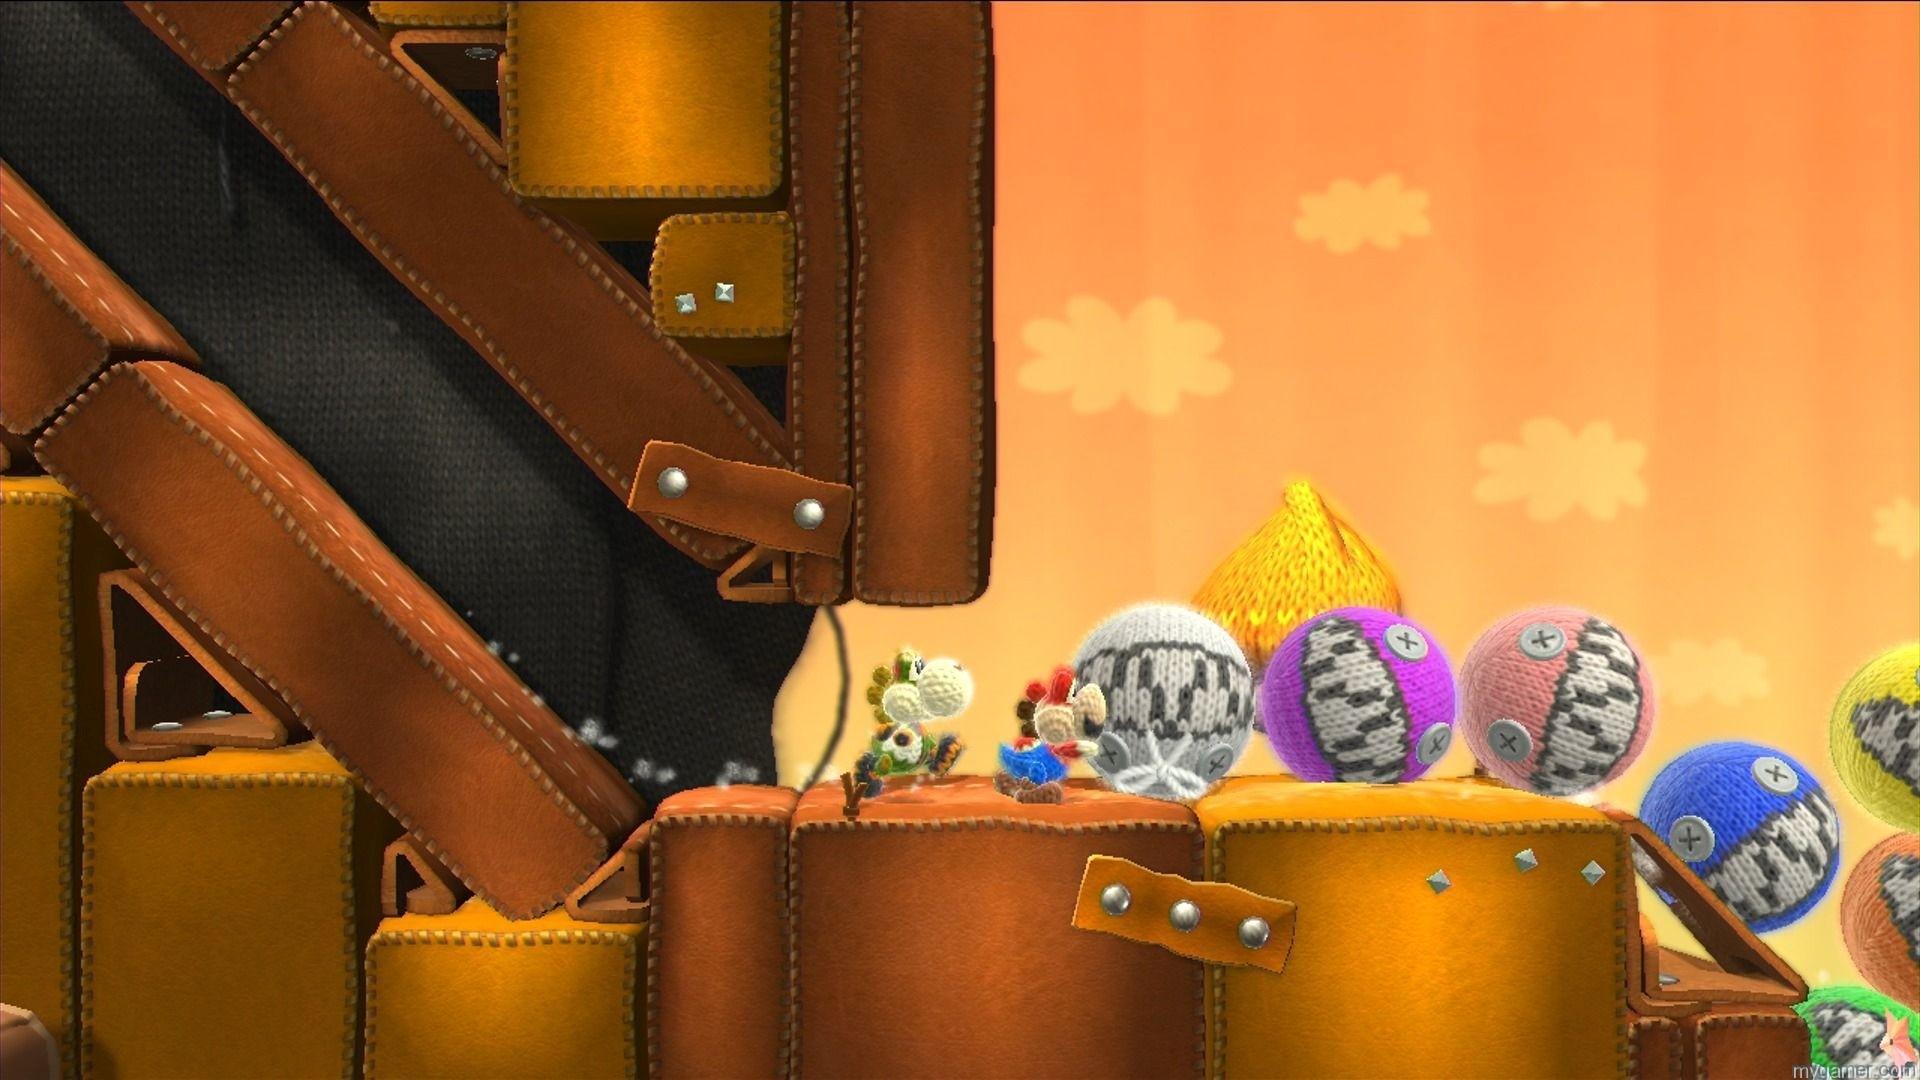 Yoshi Woolly World rockpush Yoshi's Woolly World Wii U Review Yoshi's Woolly World Wii U Review Yoshi Woolly World rockpush